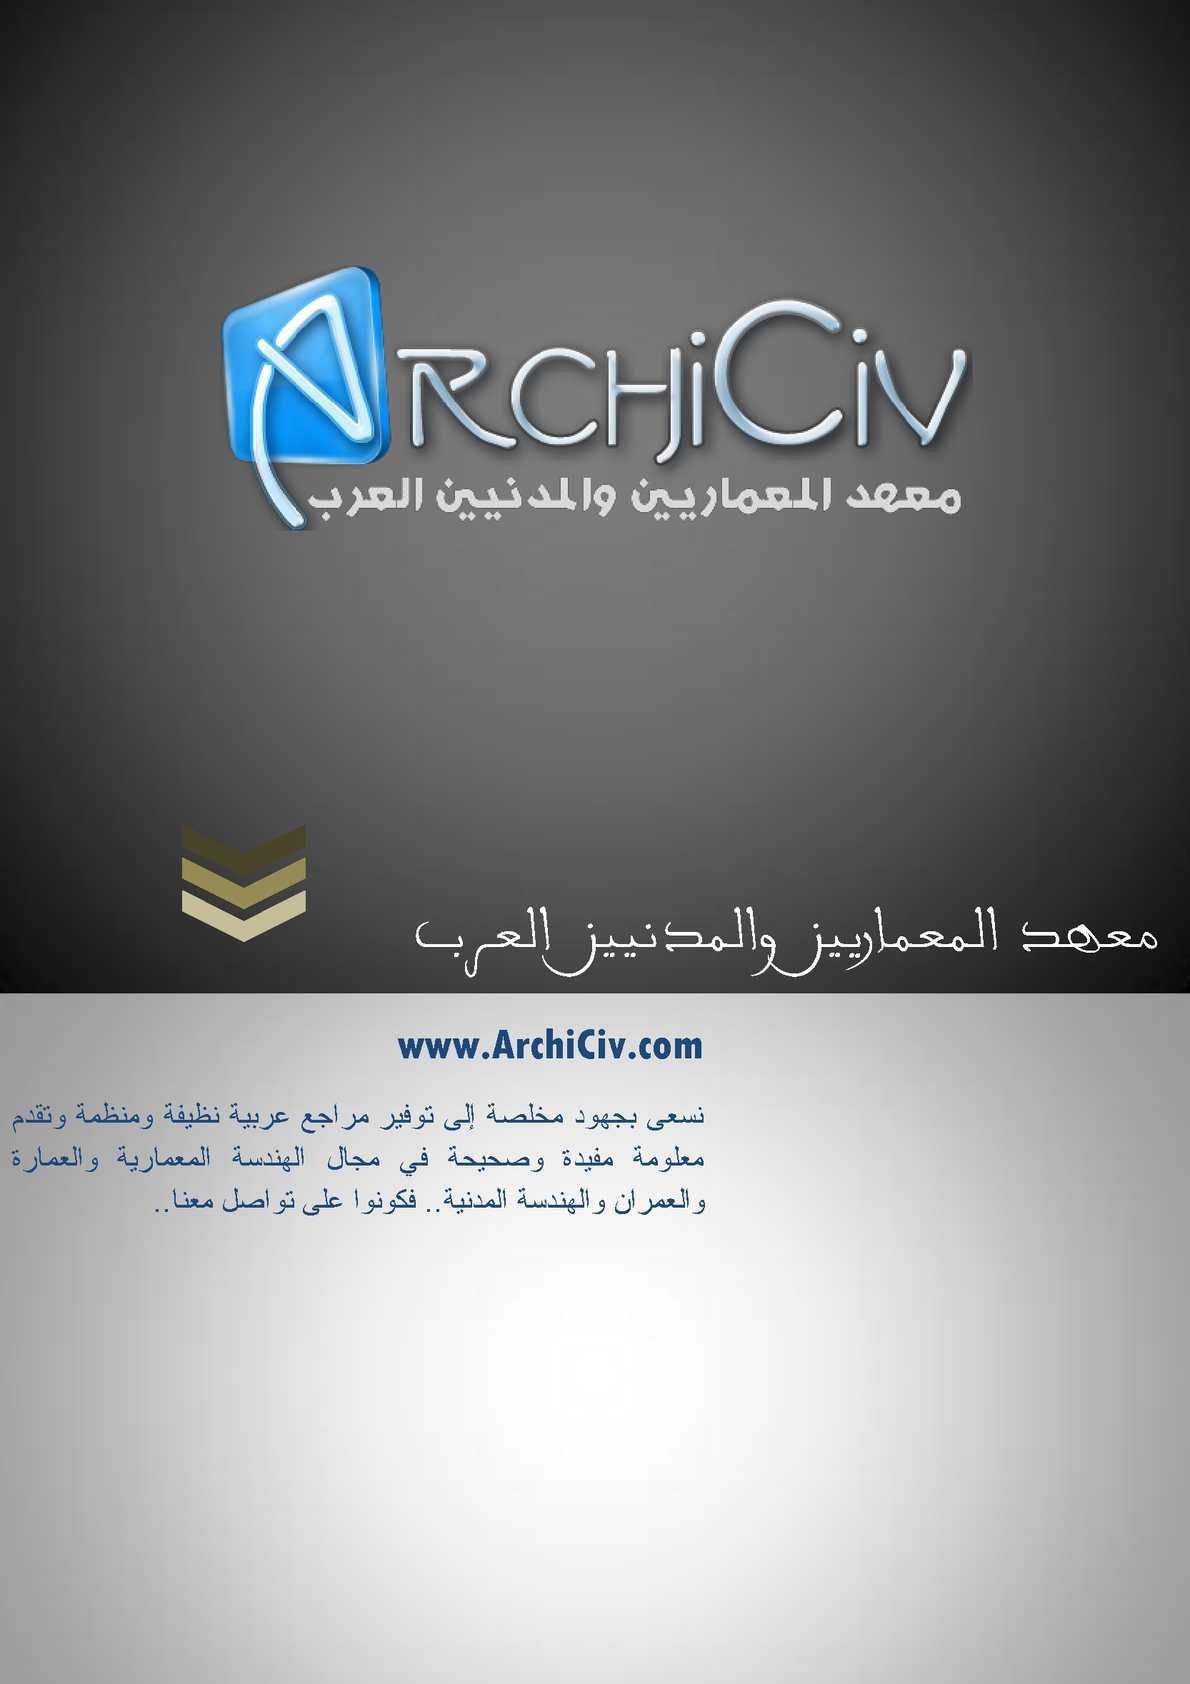 اسس التصميم _ArchiCiv.com_